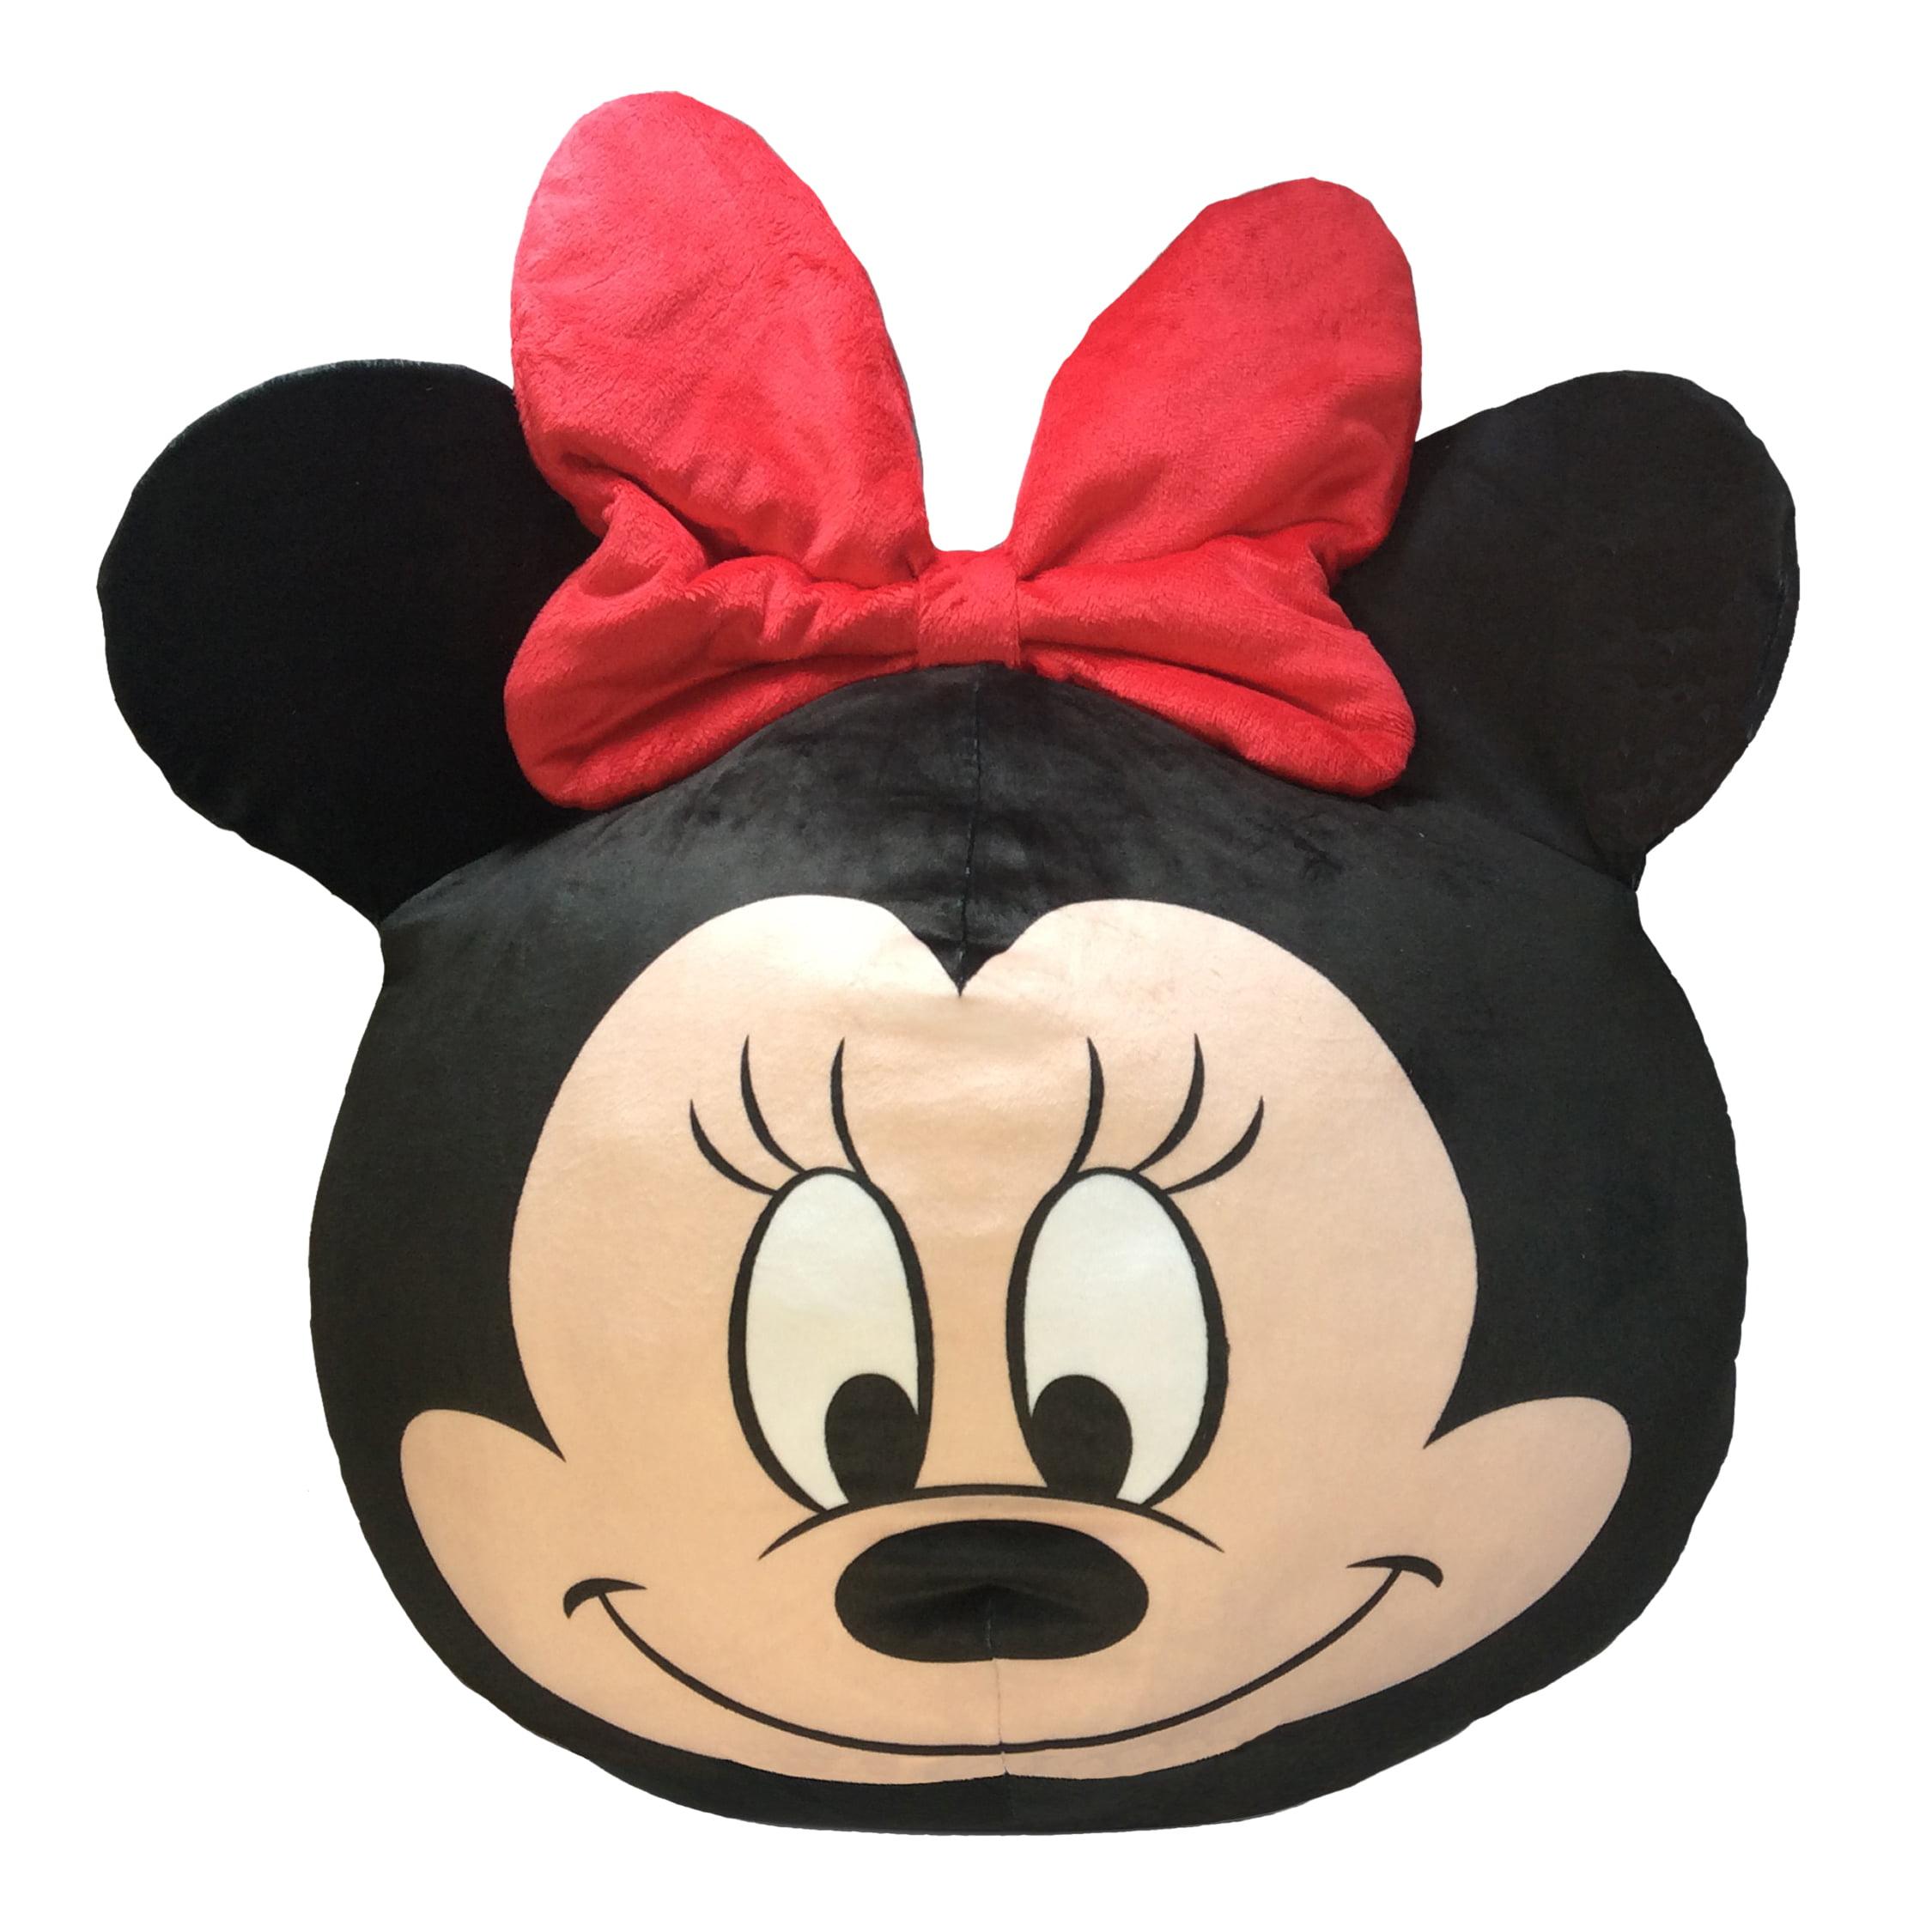 "Minnie Mouse 14"" Cloud Pillow"